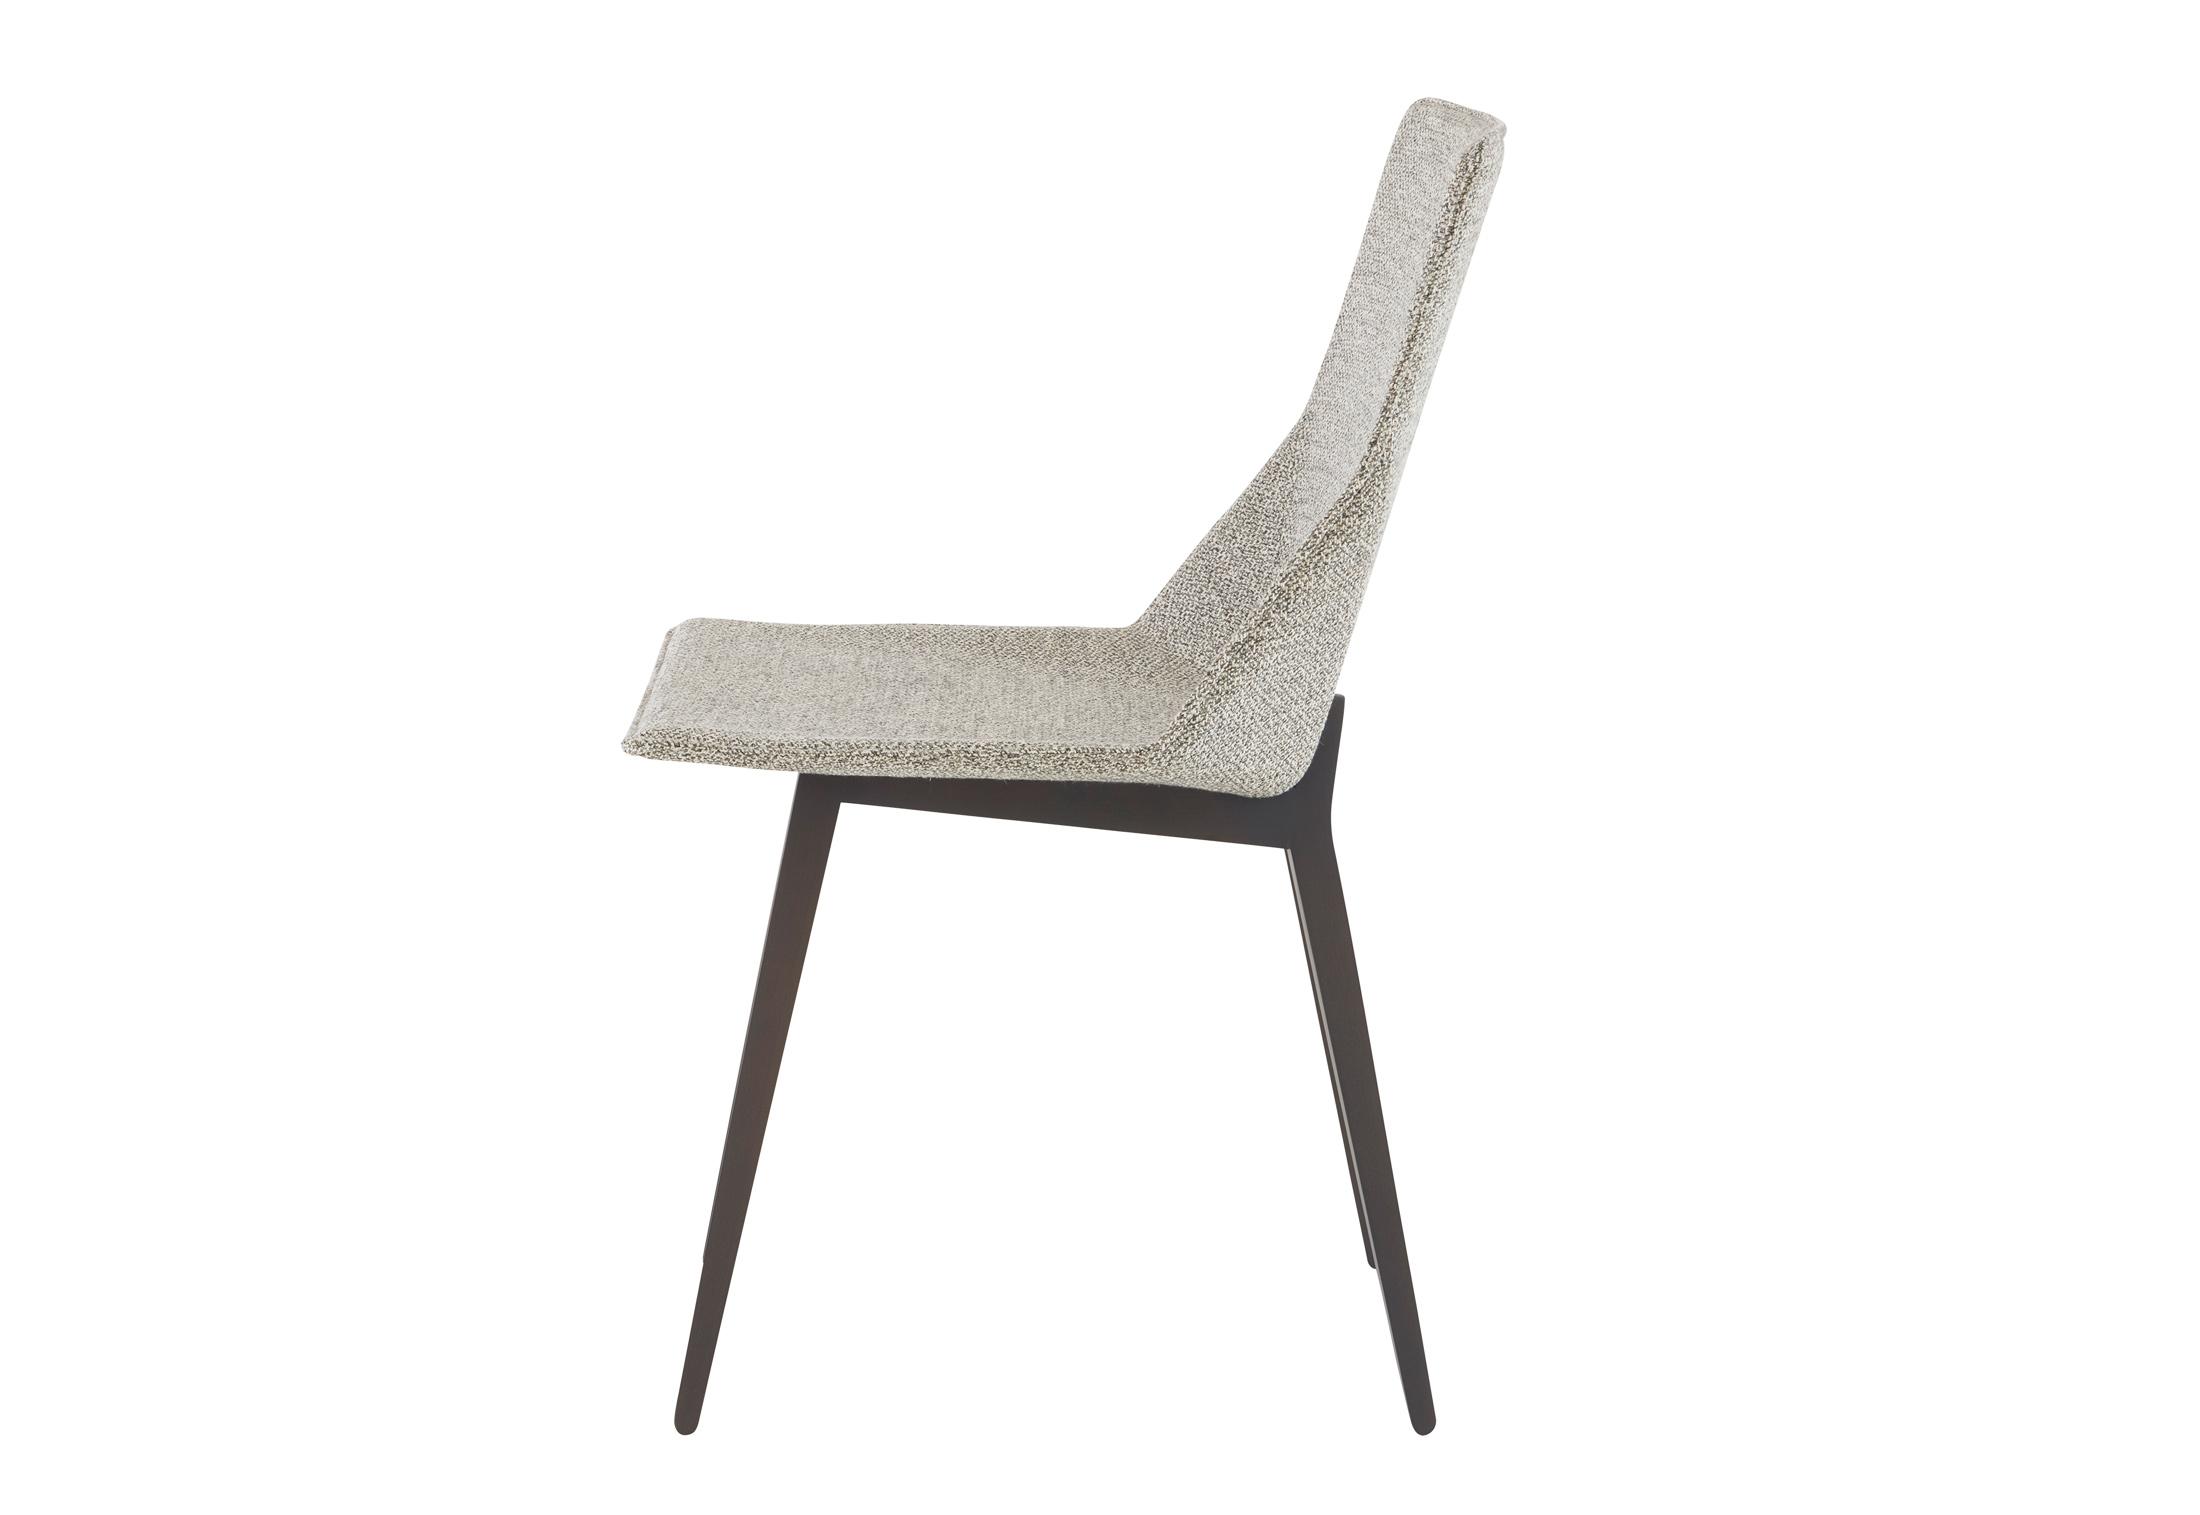 elsa stuhl mit holzbeinen von ligne roset stylepark. Black Bedroom Furniture Sets. Home Design Ideas